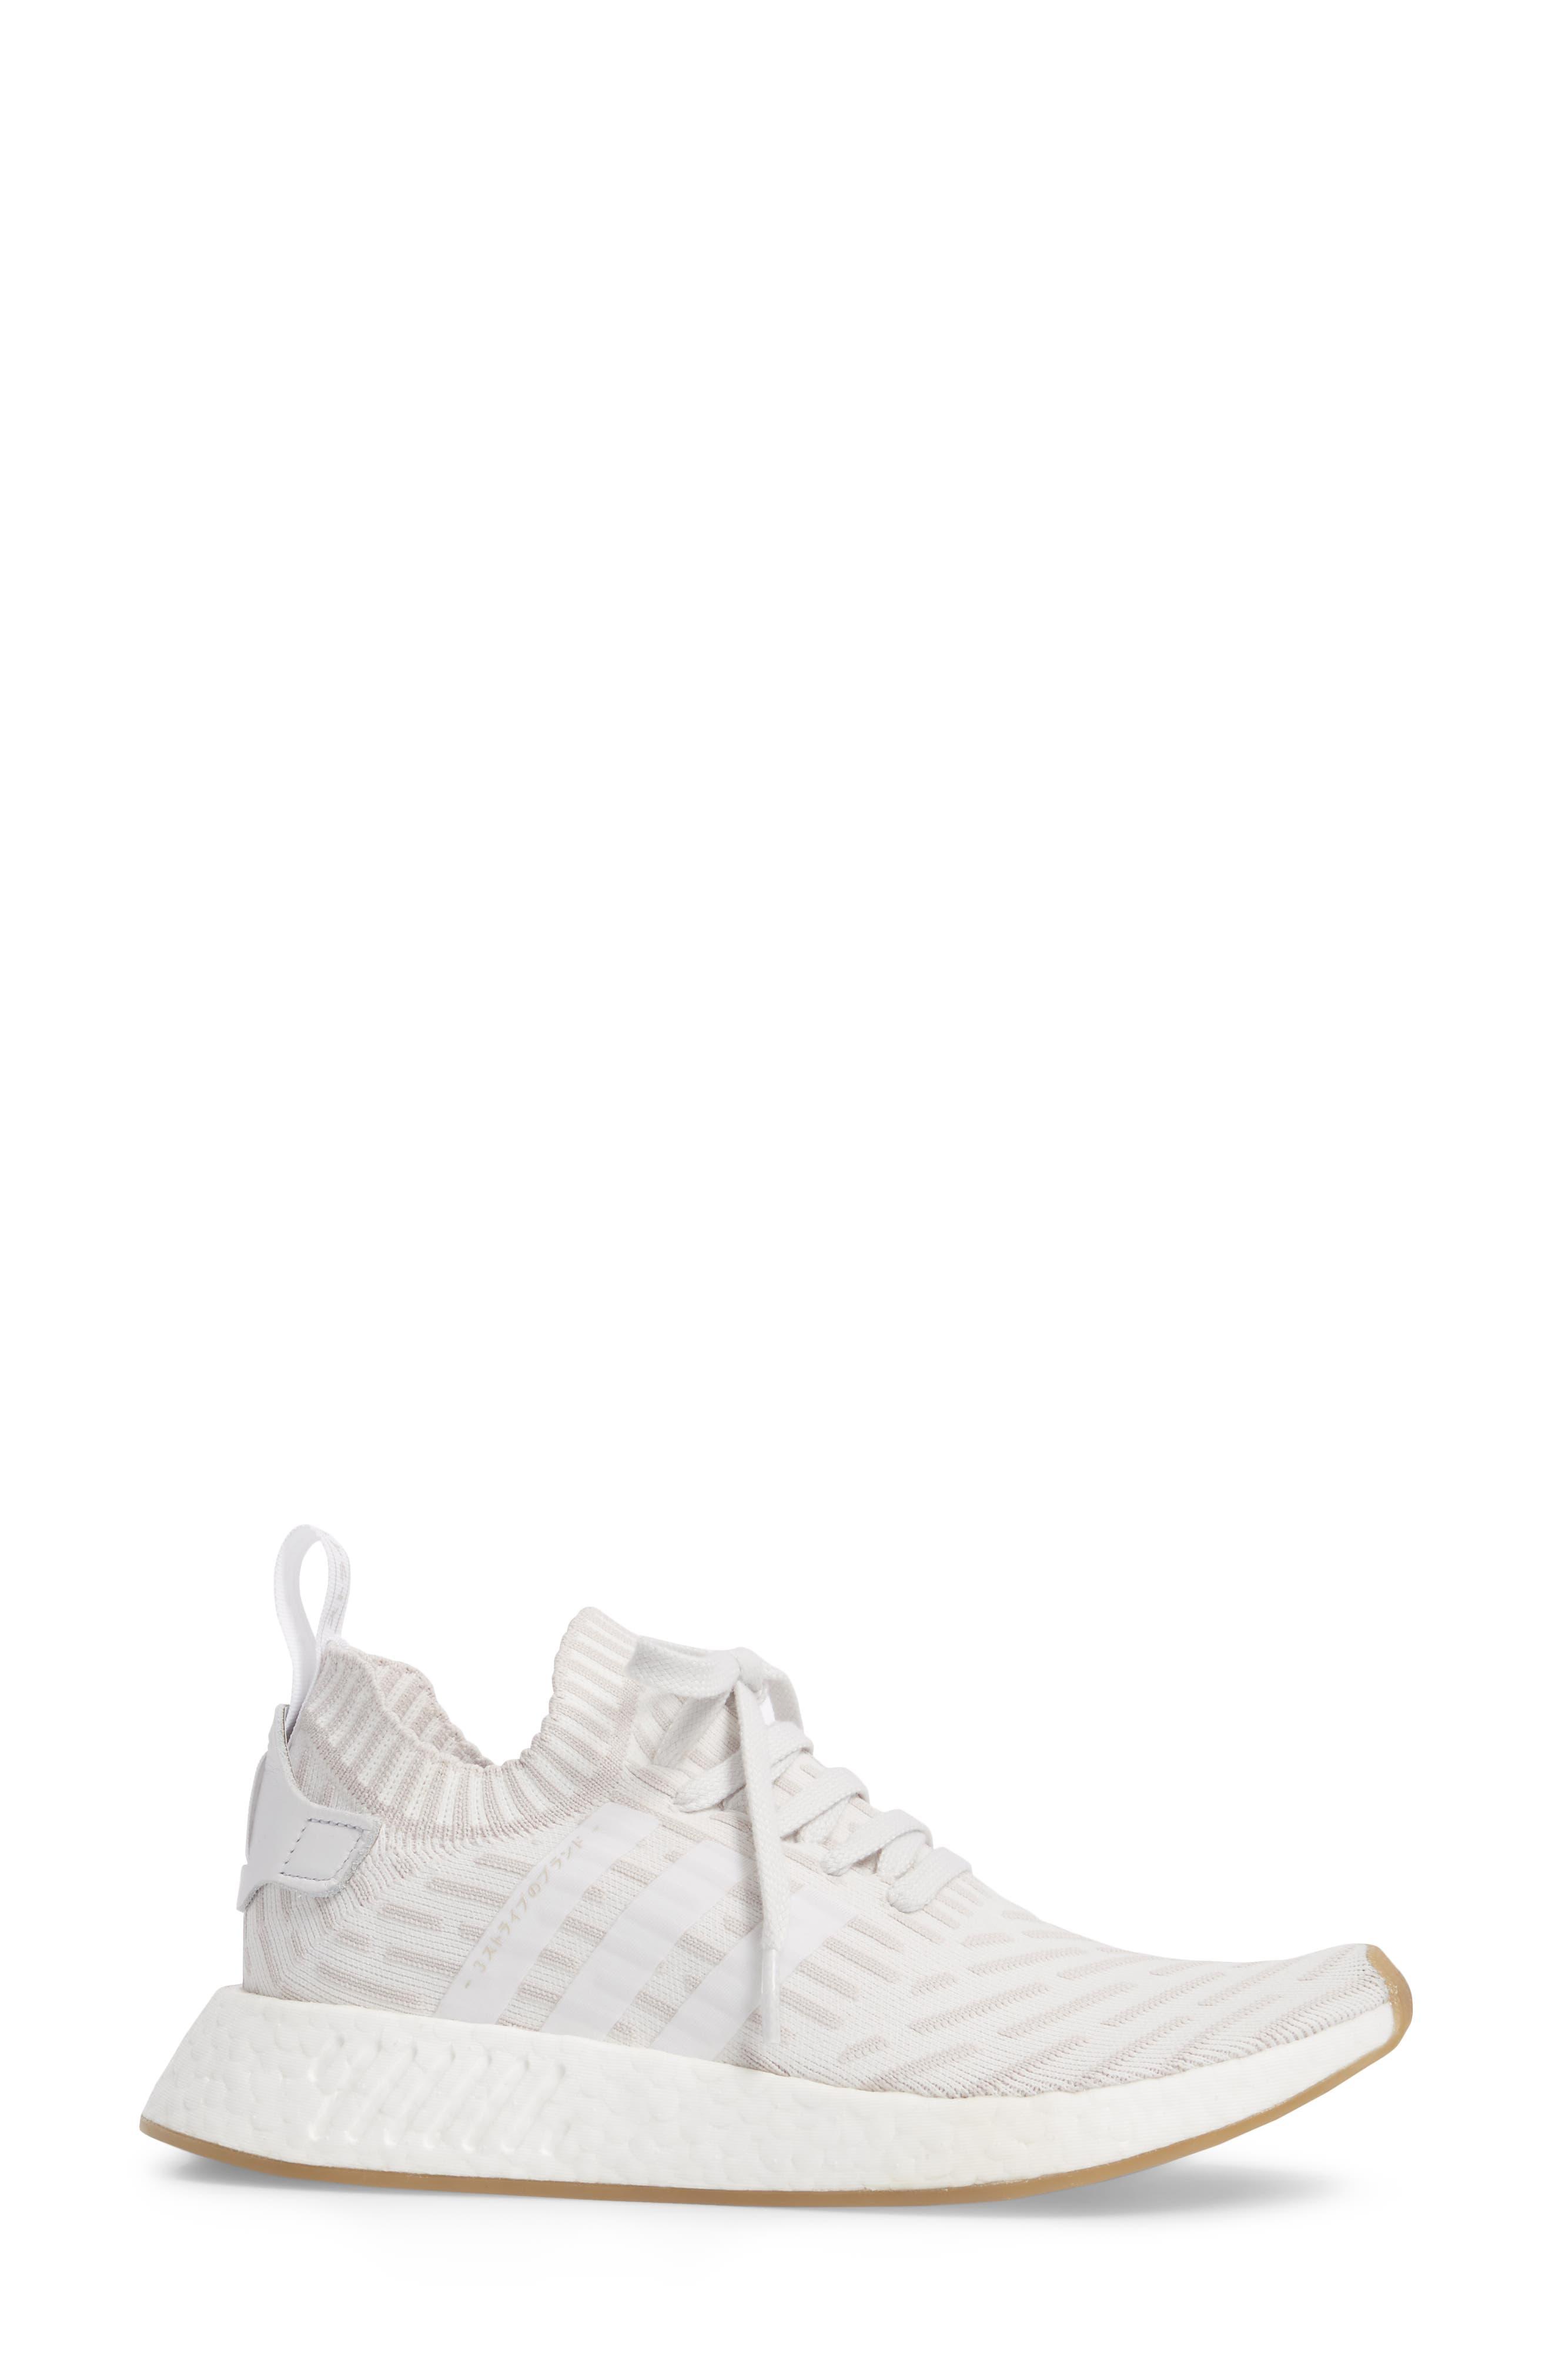 NMD R2 Primeknit Athletic Shoe,                             Alternate thumbnail 11, color,